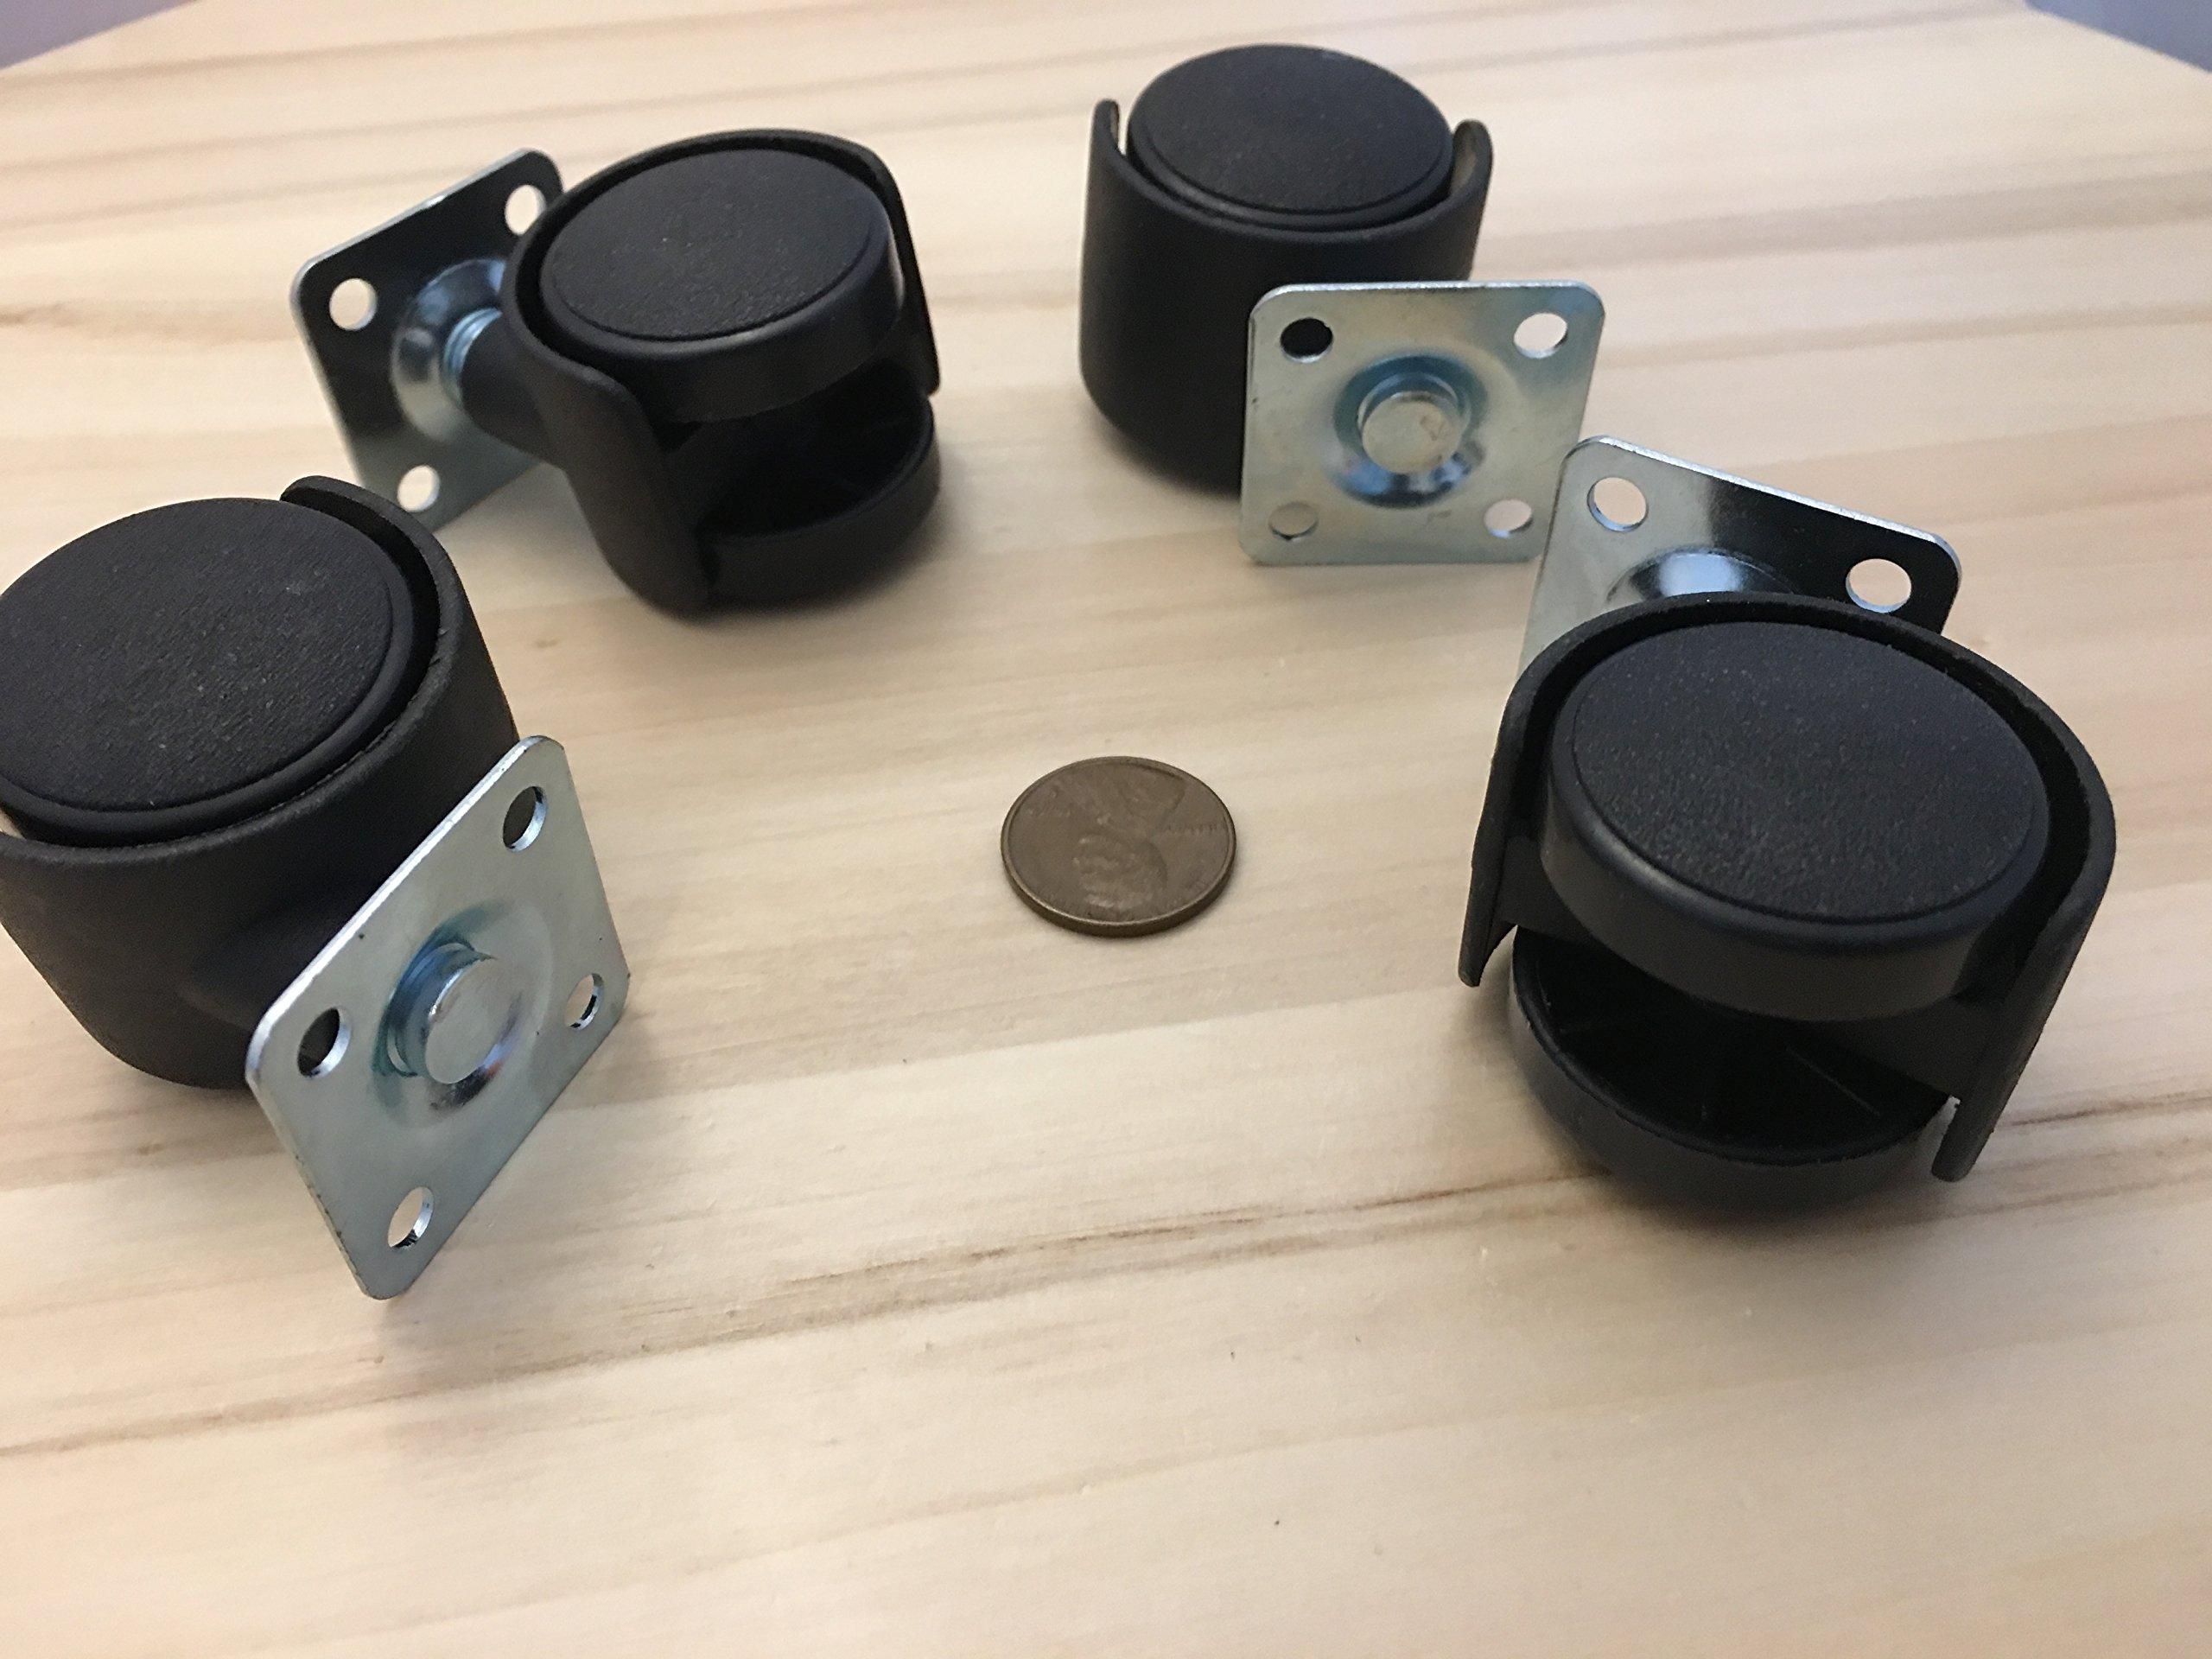 4 Pieces Small Swivel Caster Wheel robot platform office chair 30mm C22